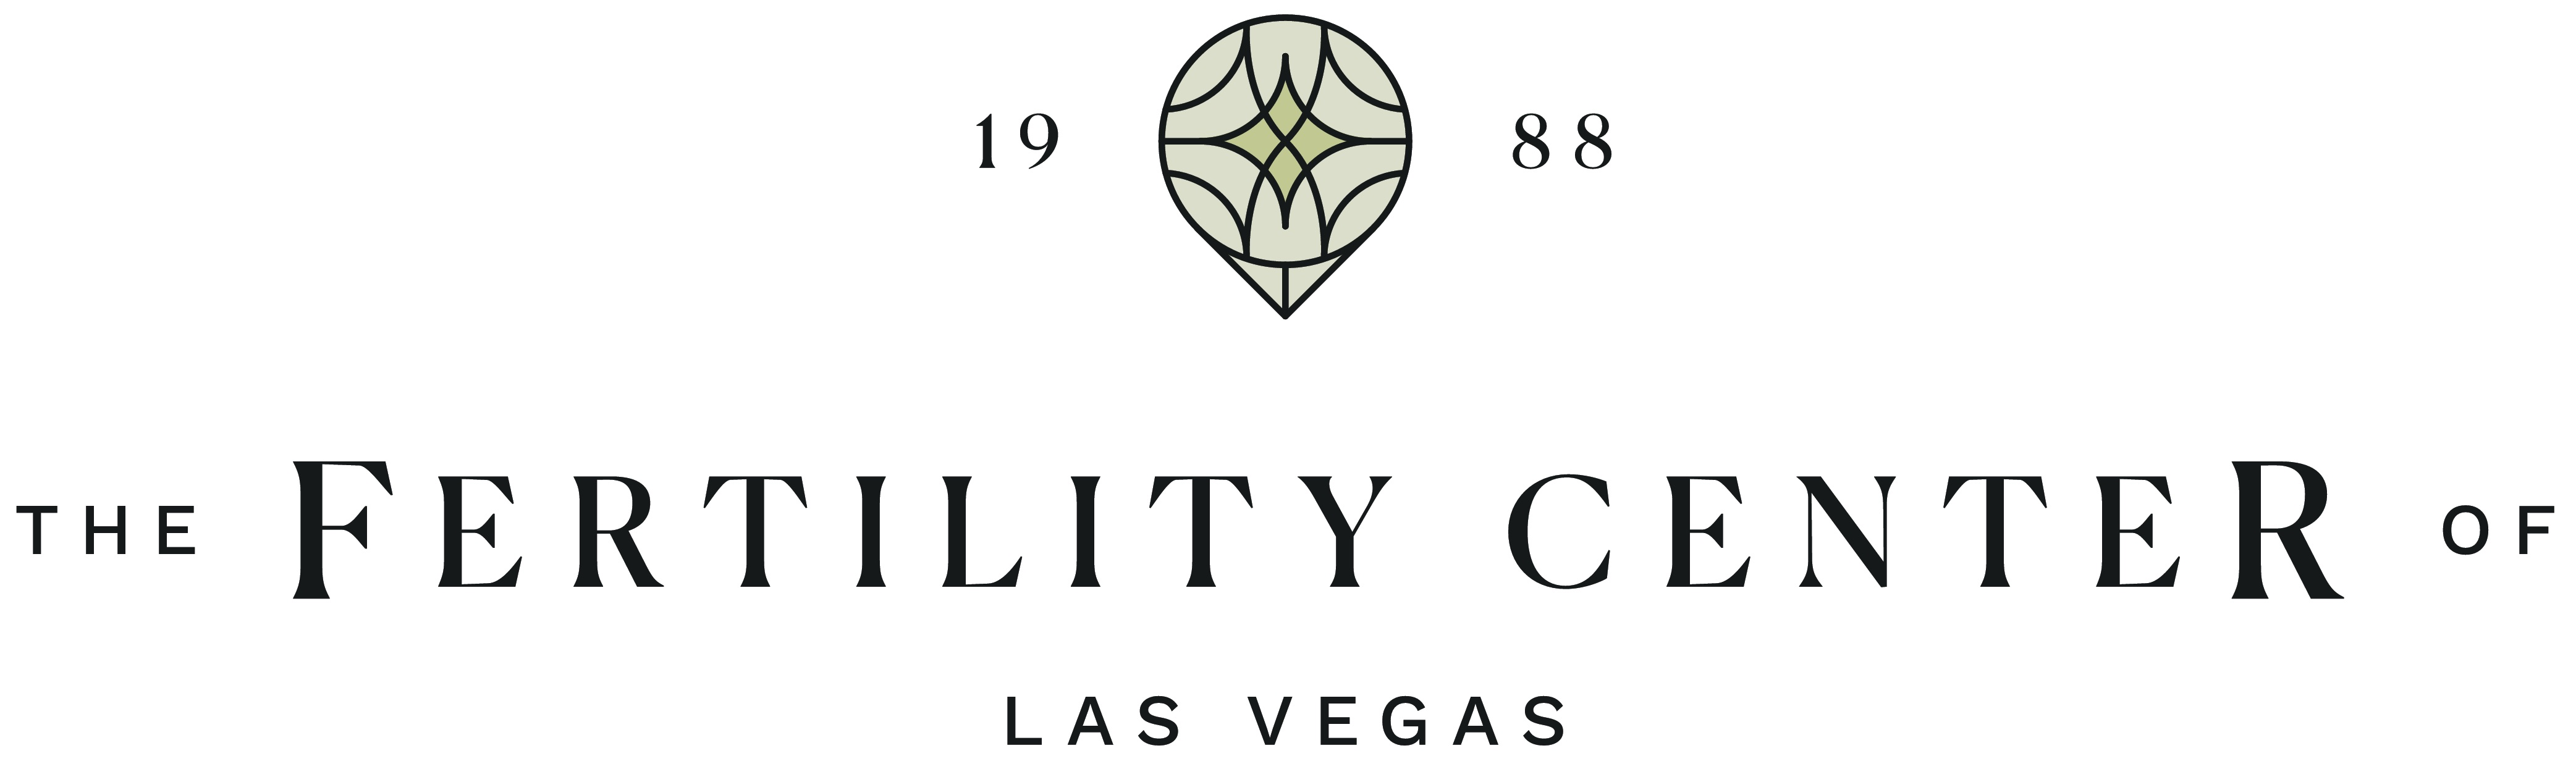 Fertility Center Of Las Vegas